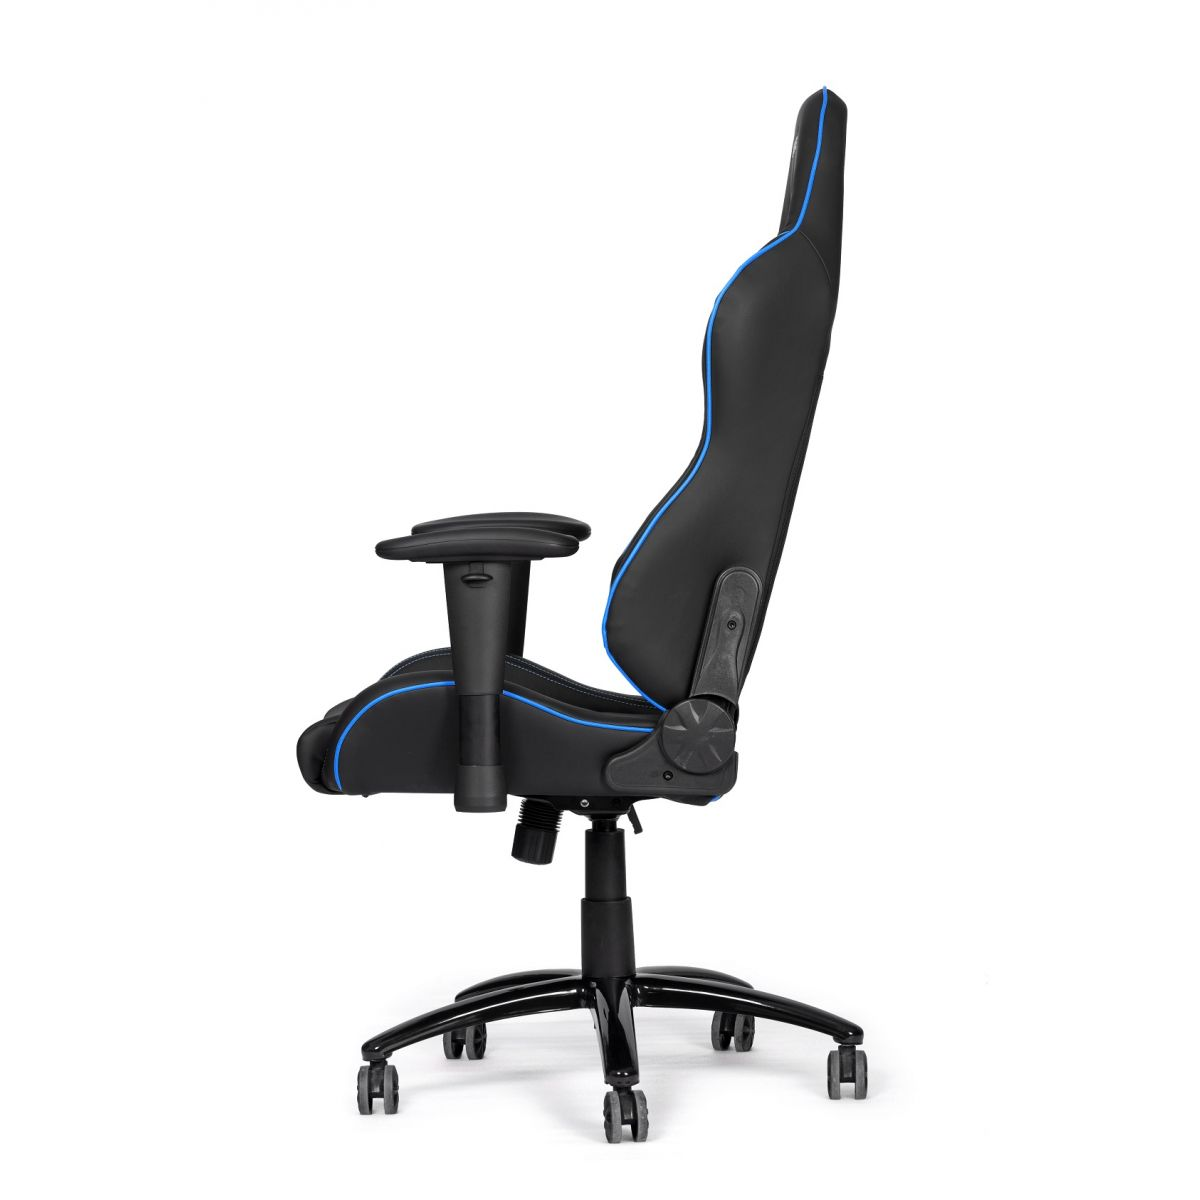 Cadeira AKRacing Octane Gaming Blue AK-OCTANE-BL - AKRacing